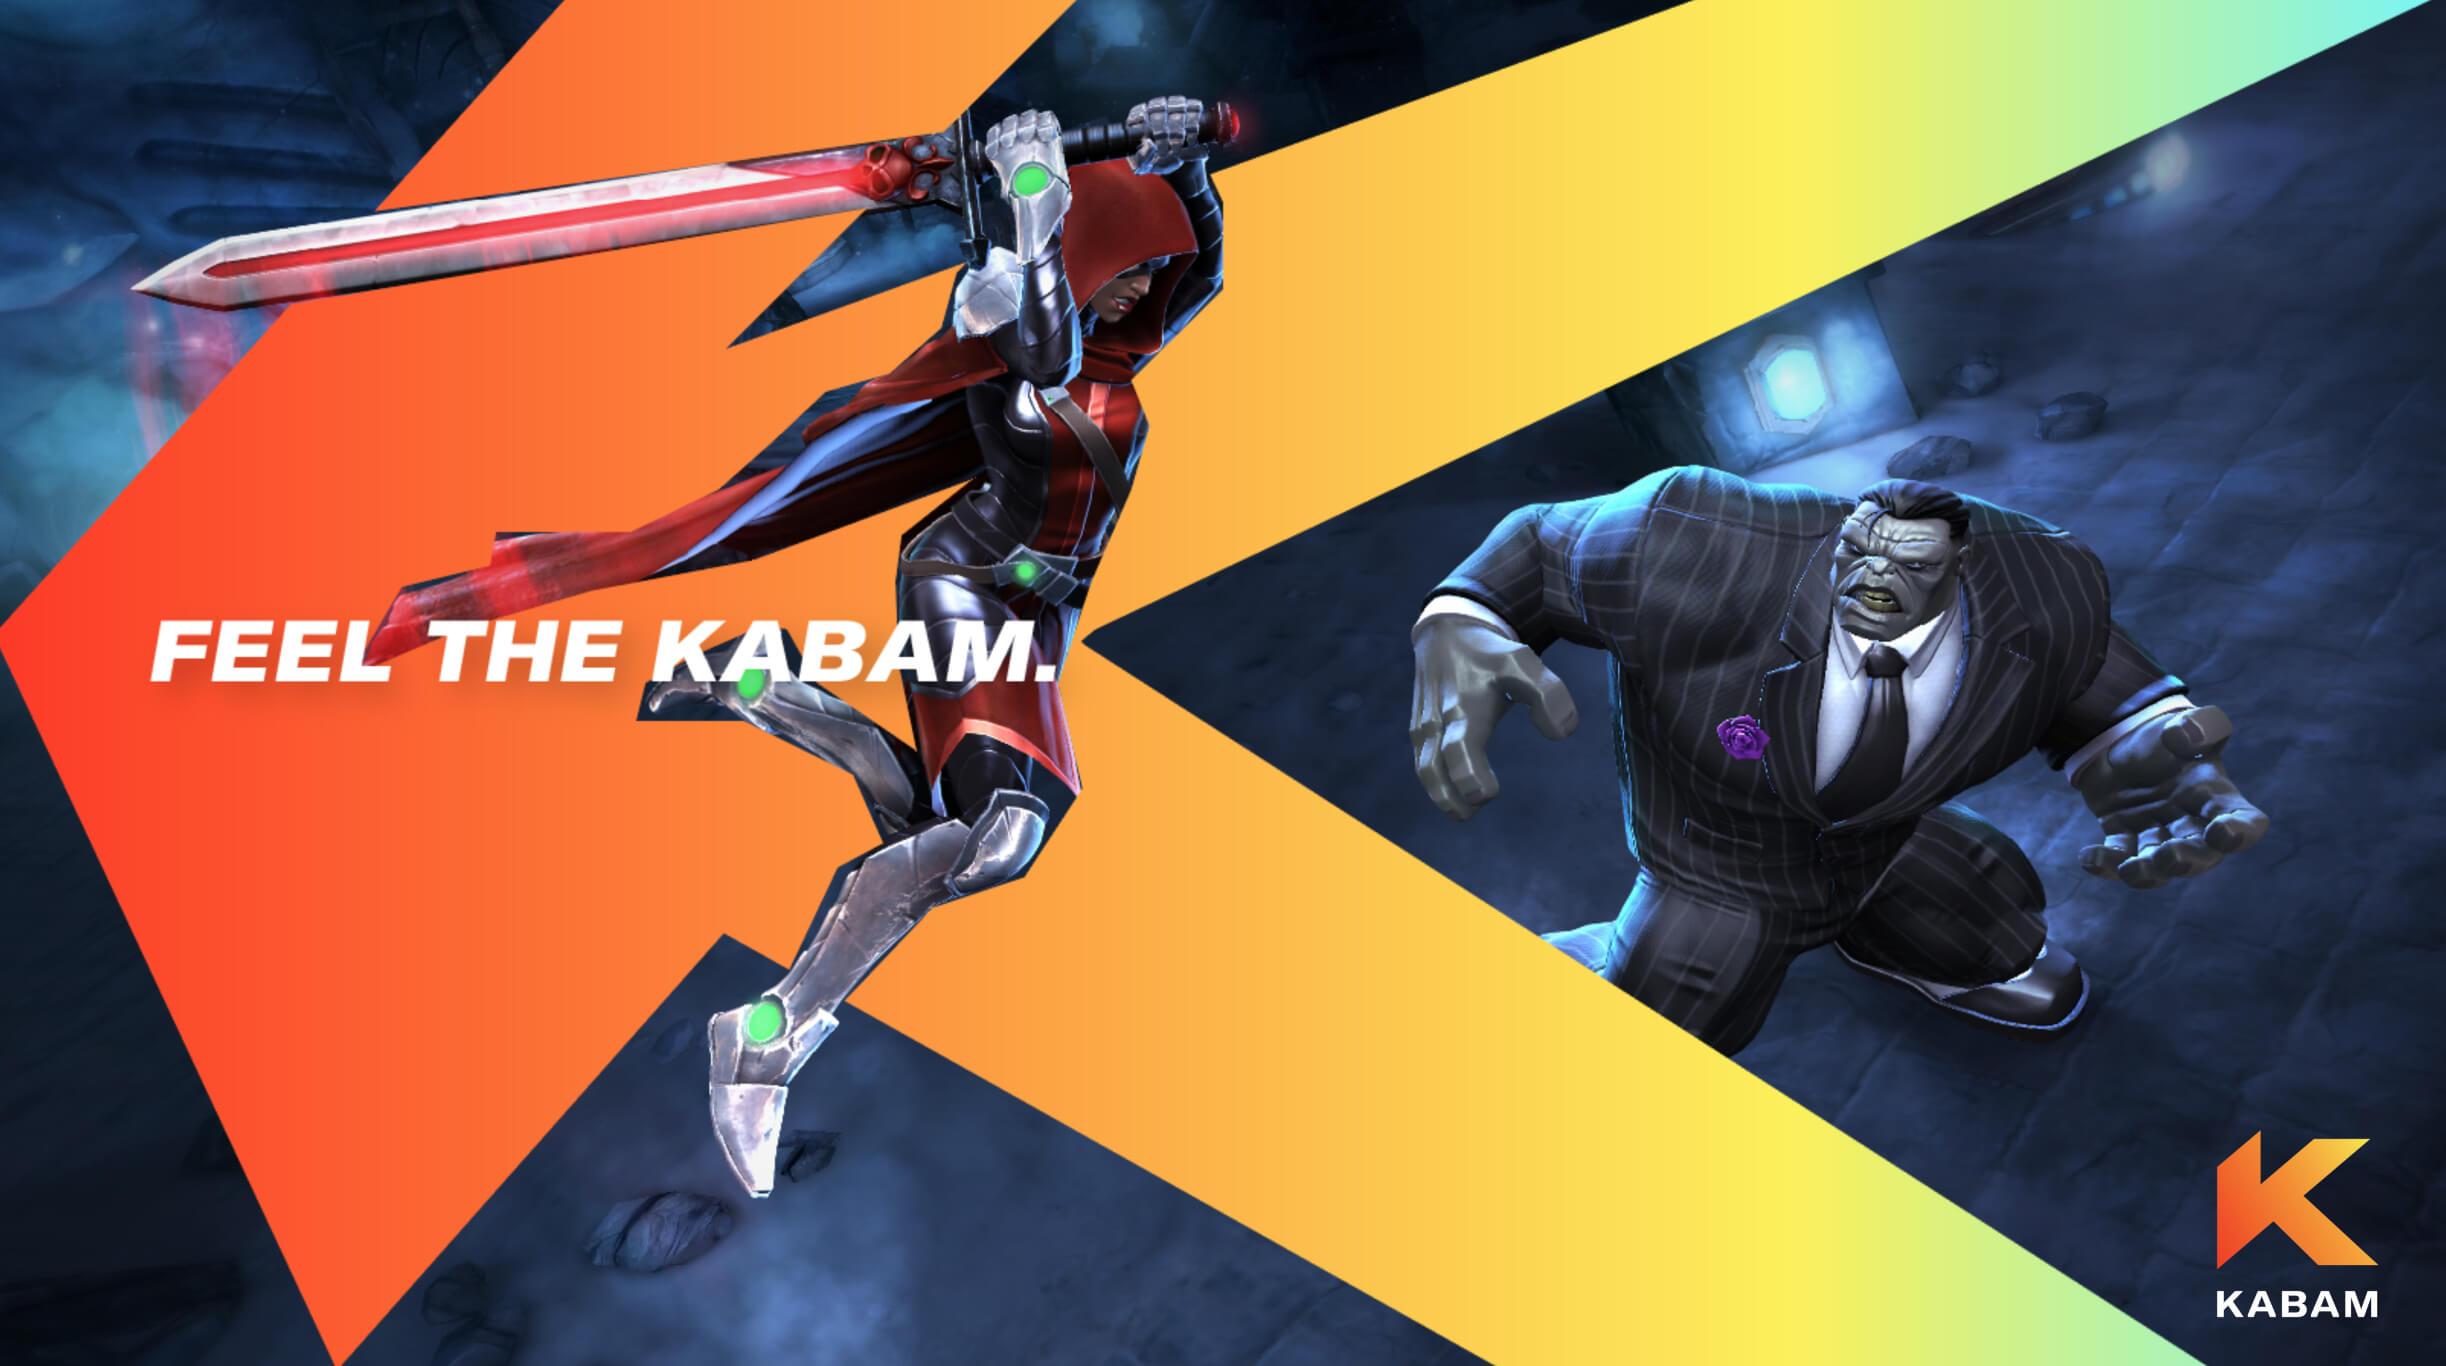 KABAM-Poster-Design